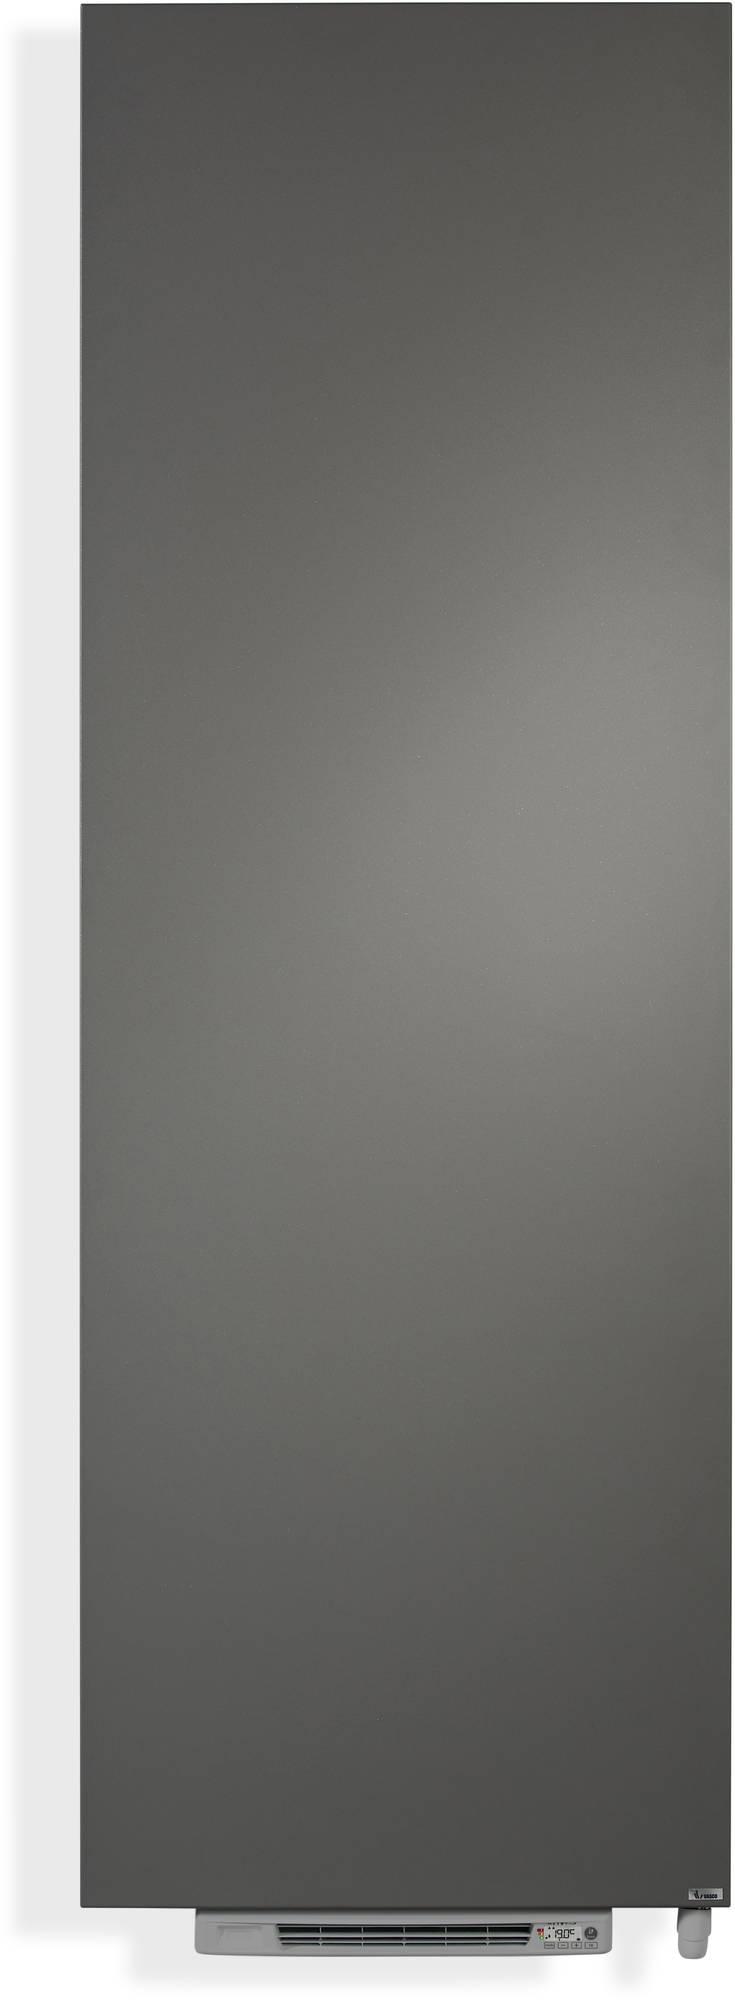 Vasco Niva N1L1-EL Blower elektrische radiator 183x62cm 2250W Wit Structuur